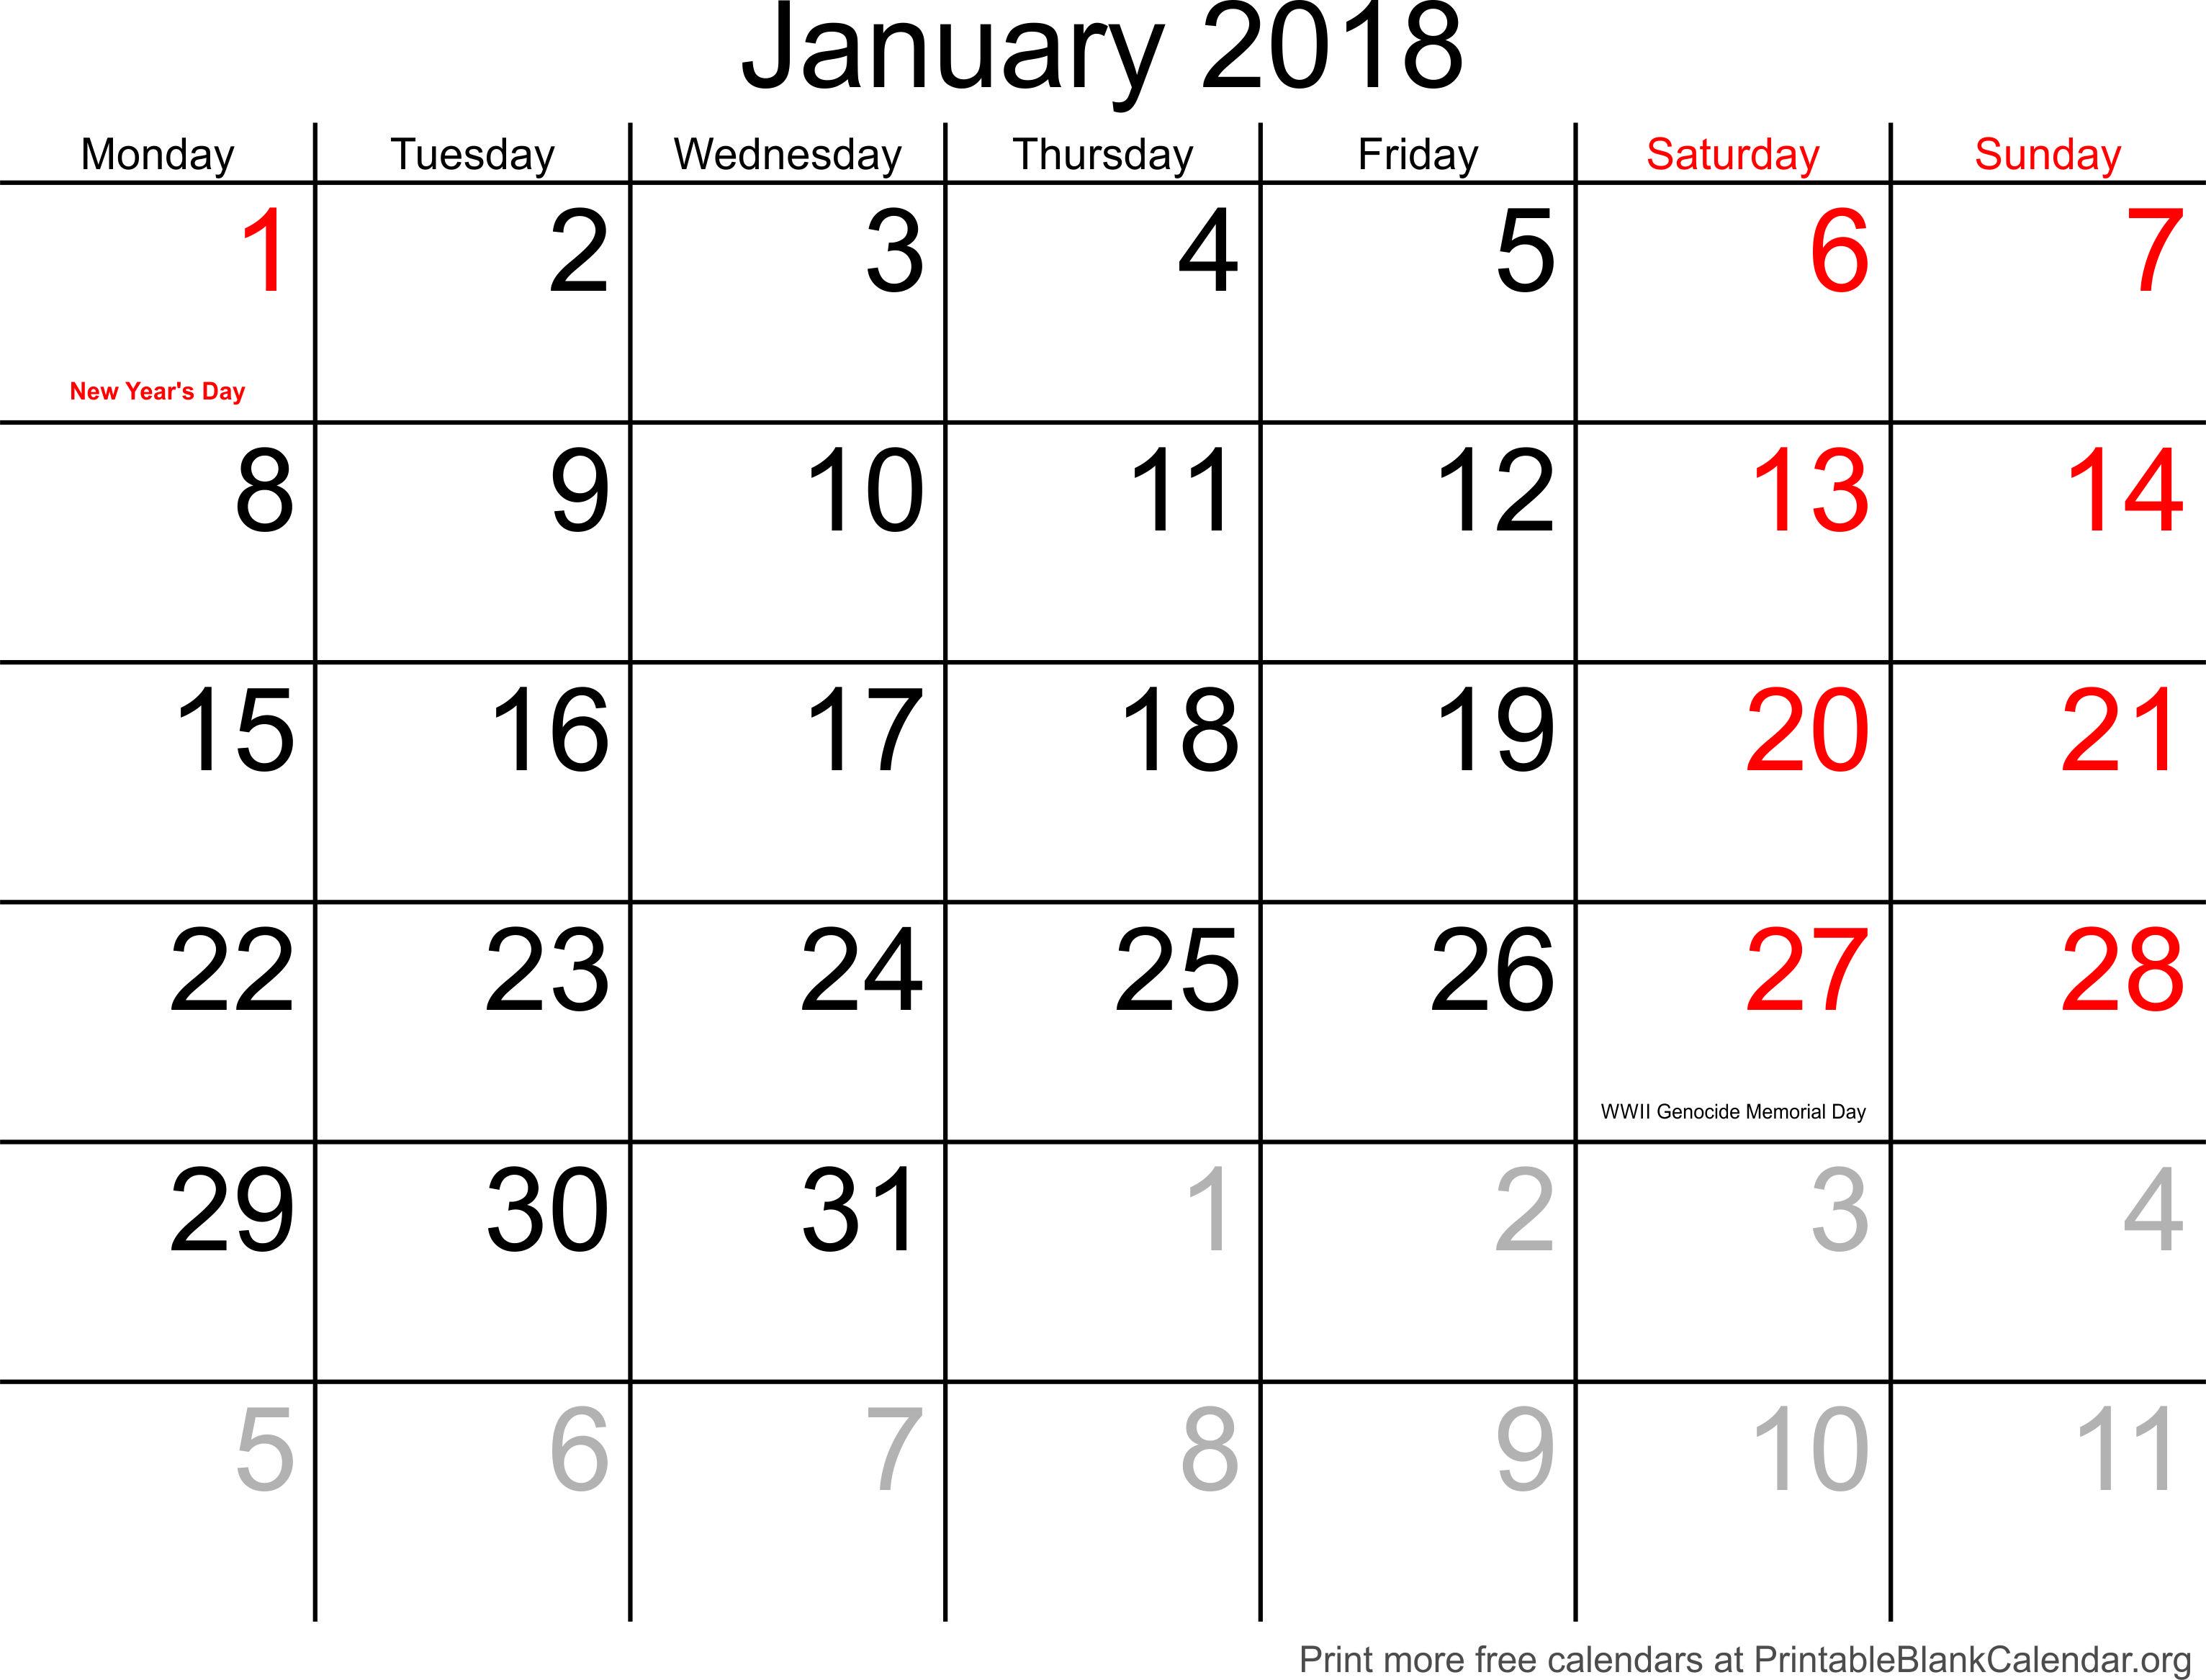 image regarding Printable Calendar January titled printable calendar January 2018 - Printable Blank